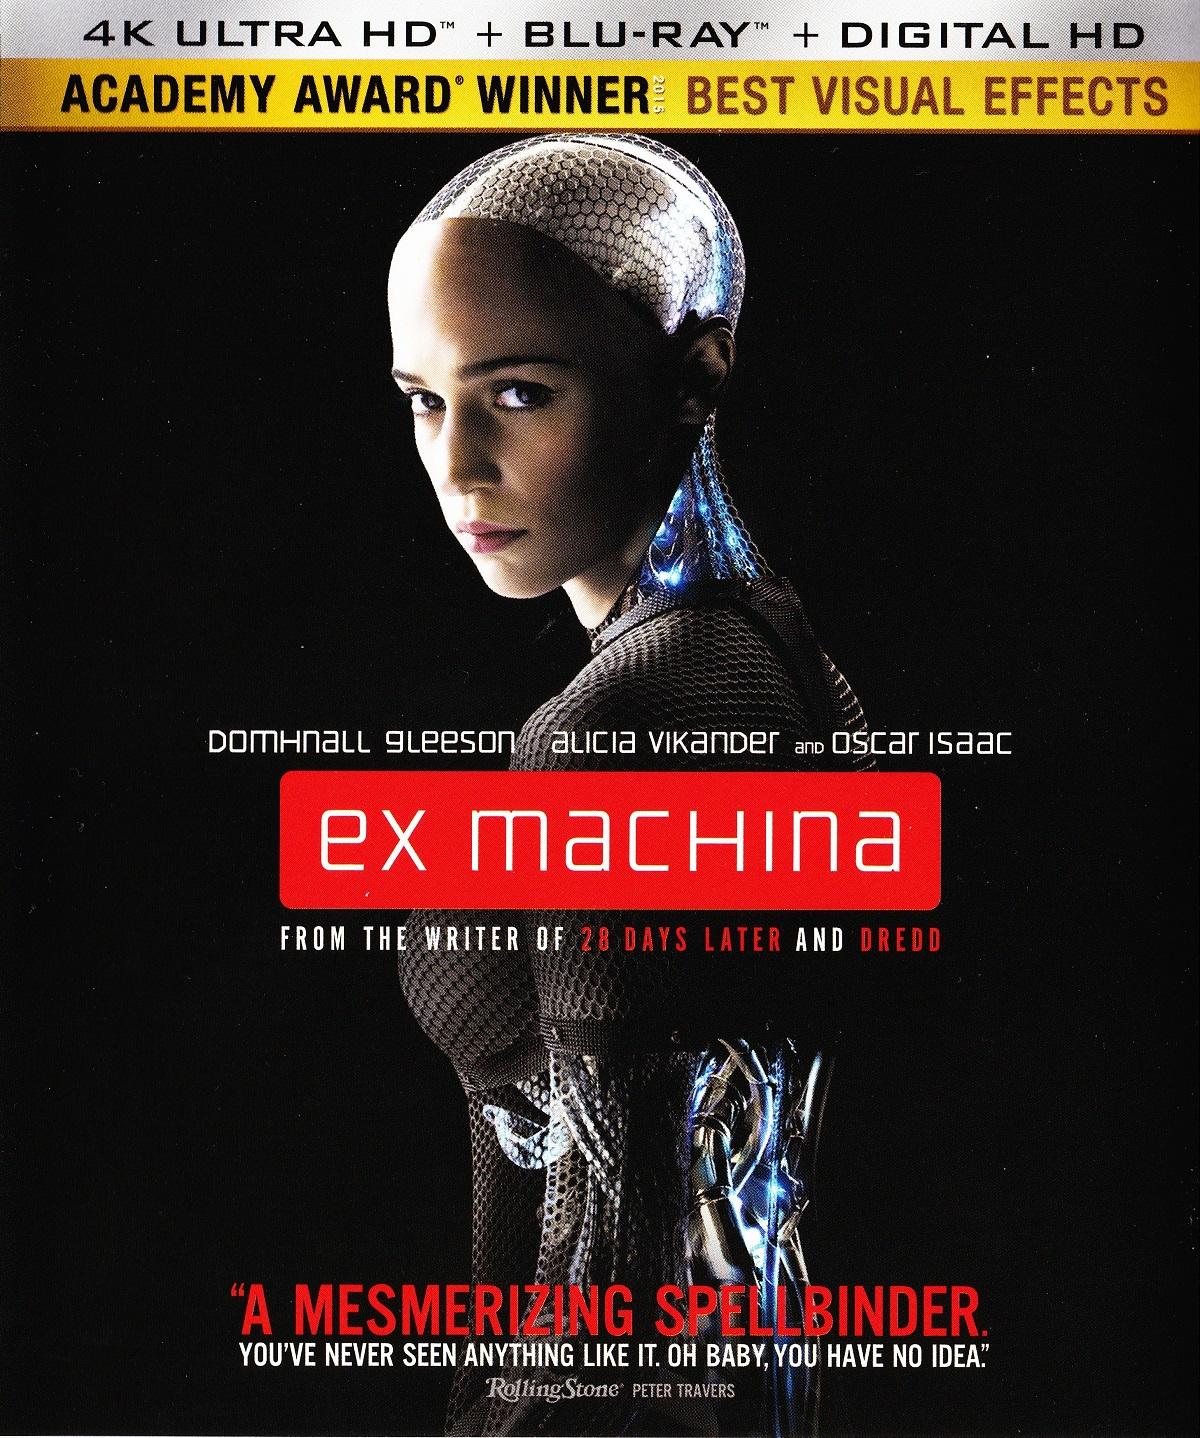 ex-machina-4k-front.jpg